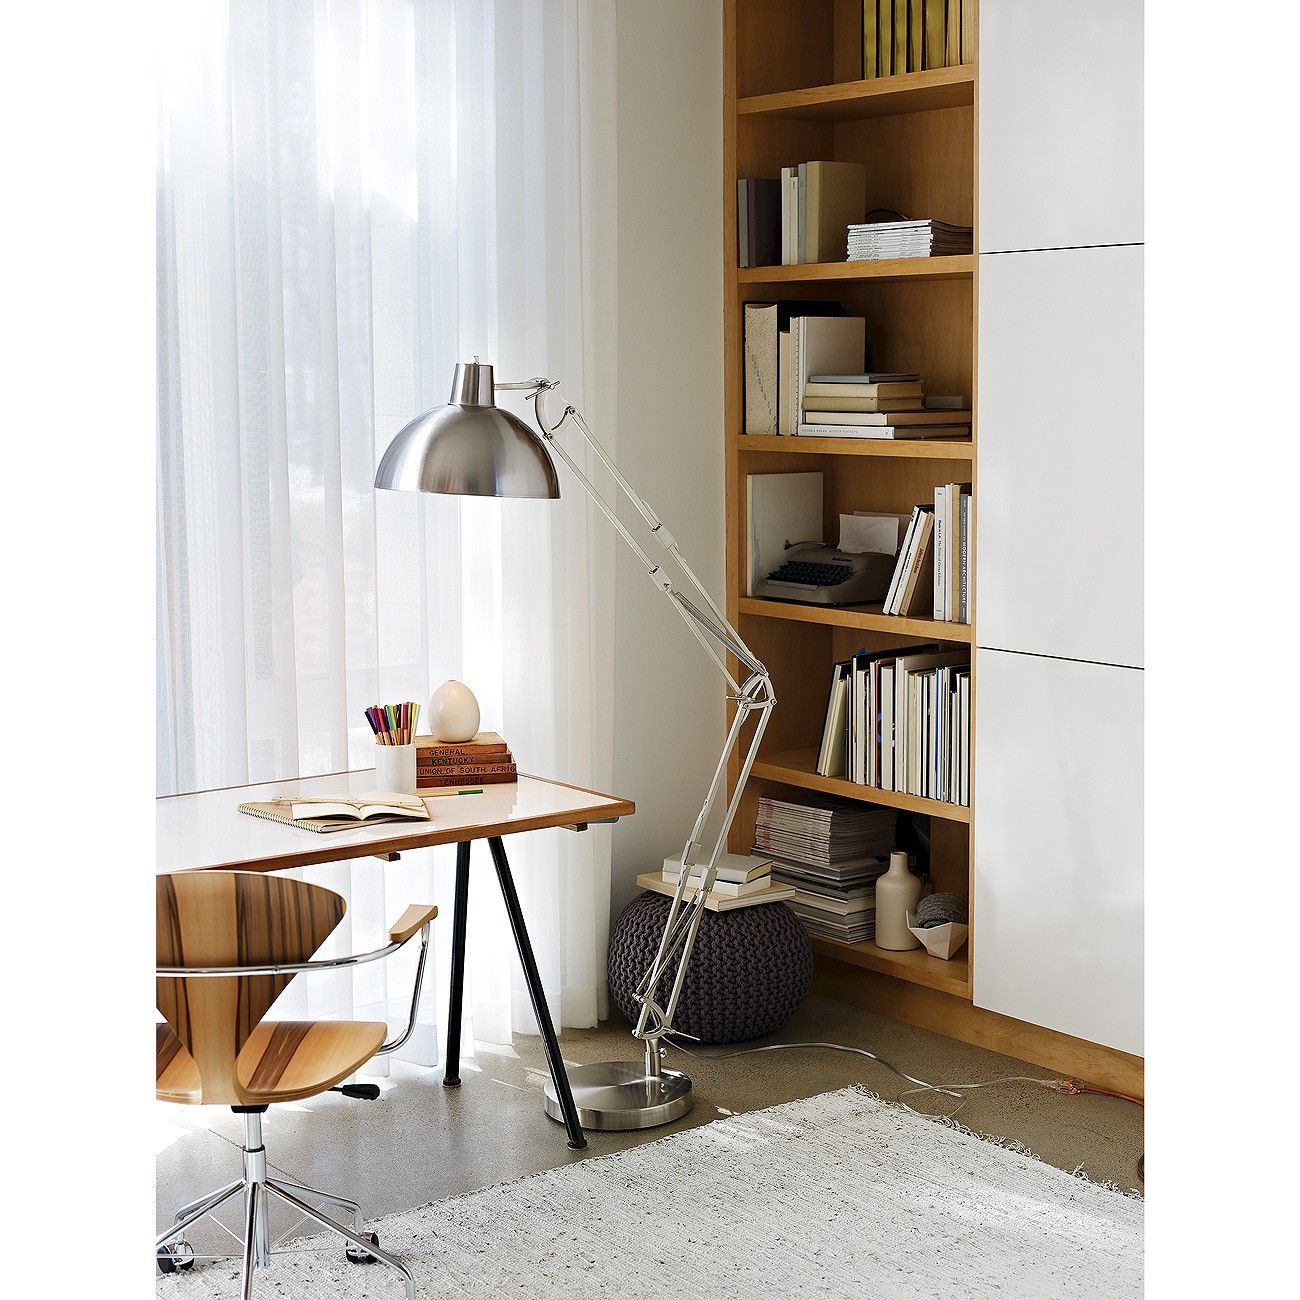 Amazing Jumbo Architect Floor Lamp (Includes CFL Bulb) On My Wish List